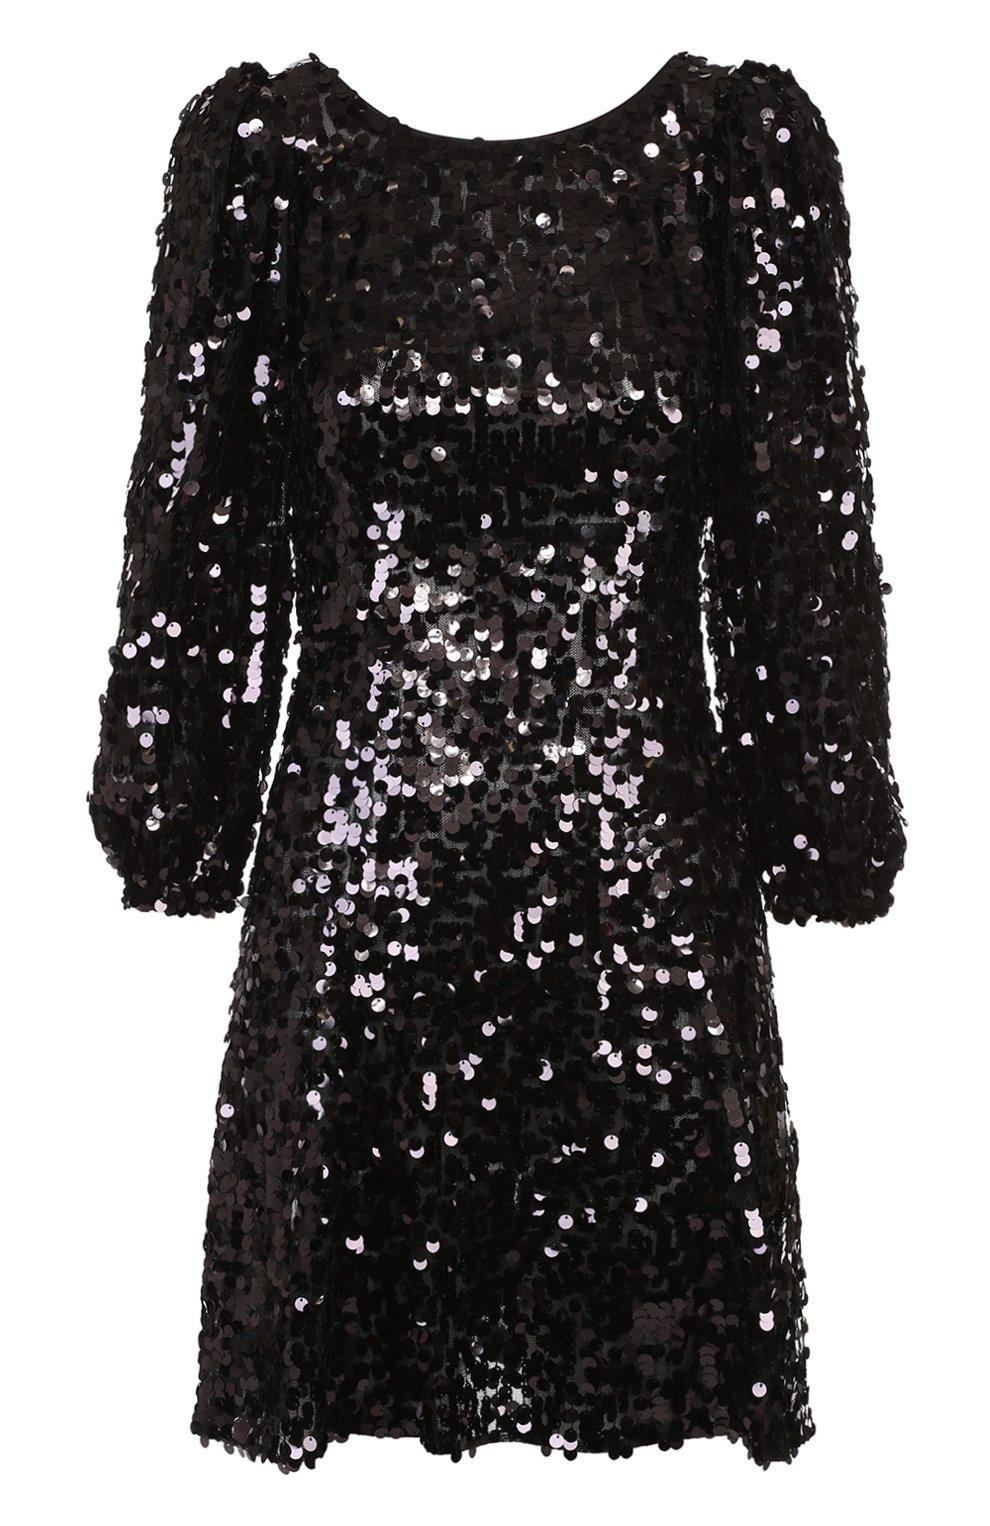 Мини-платье с пайетками и рукавом-фонарик | Фото №1